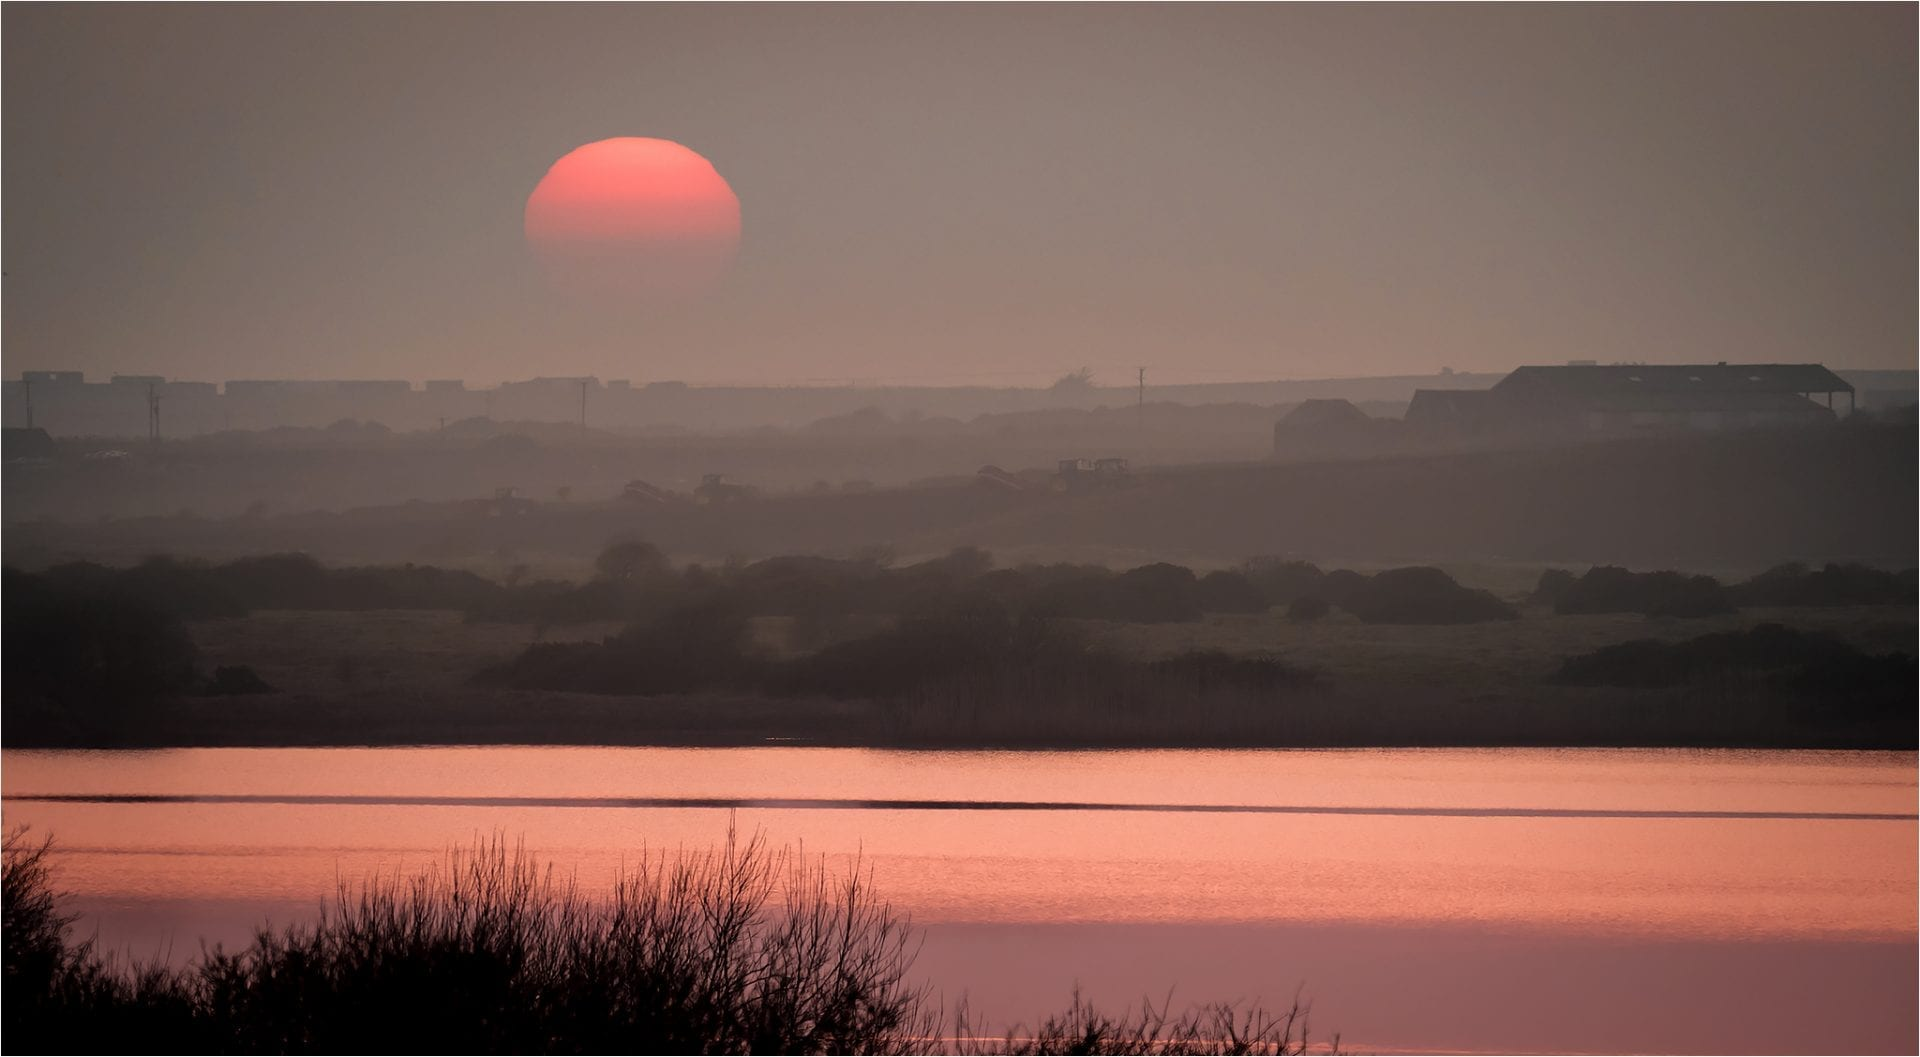 SUNSET OVER LLYN CORON